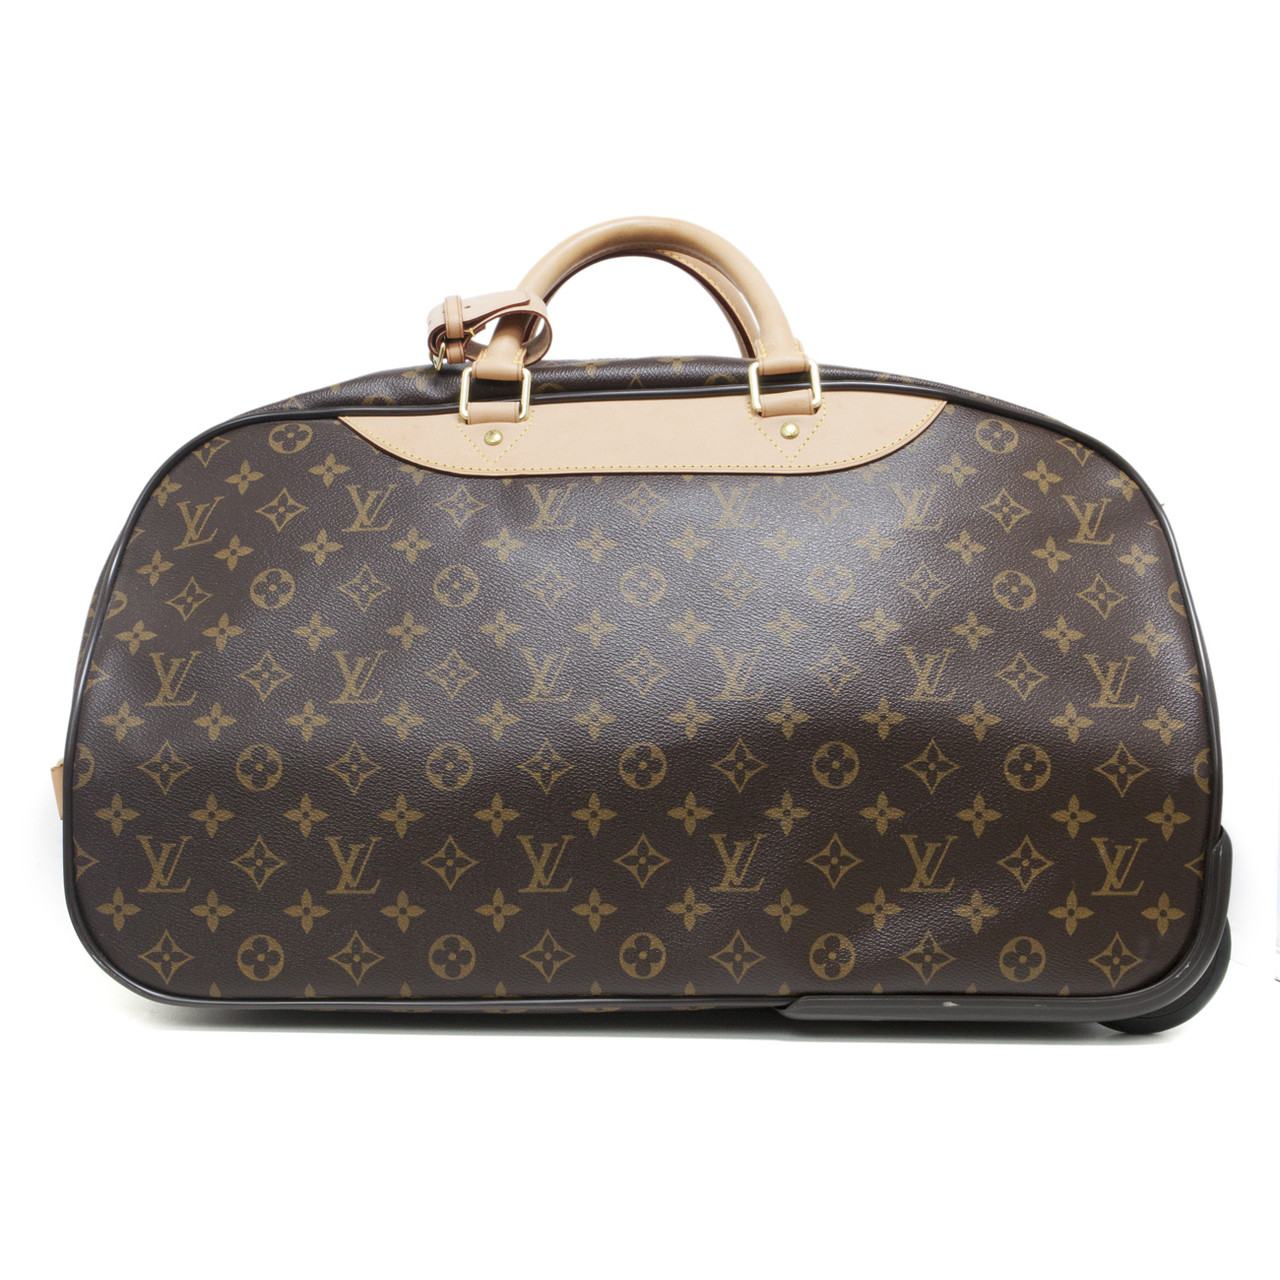 ae9c81a9090c Louis Vuitton Monogram Eole 50 Rolling Luggage - modaselle